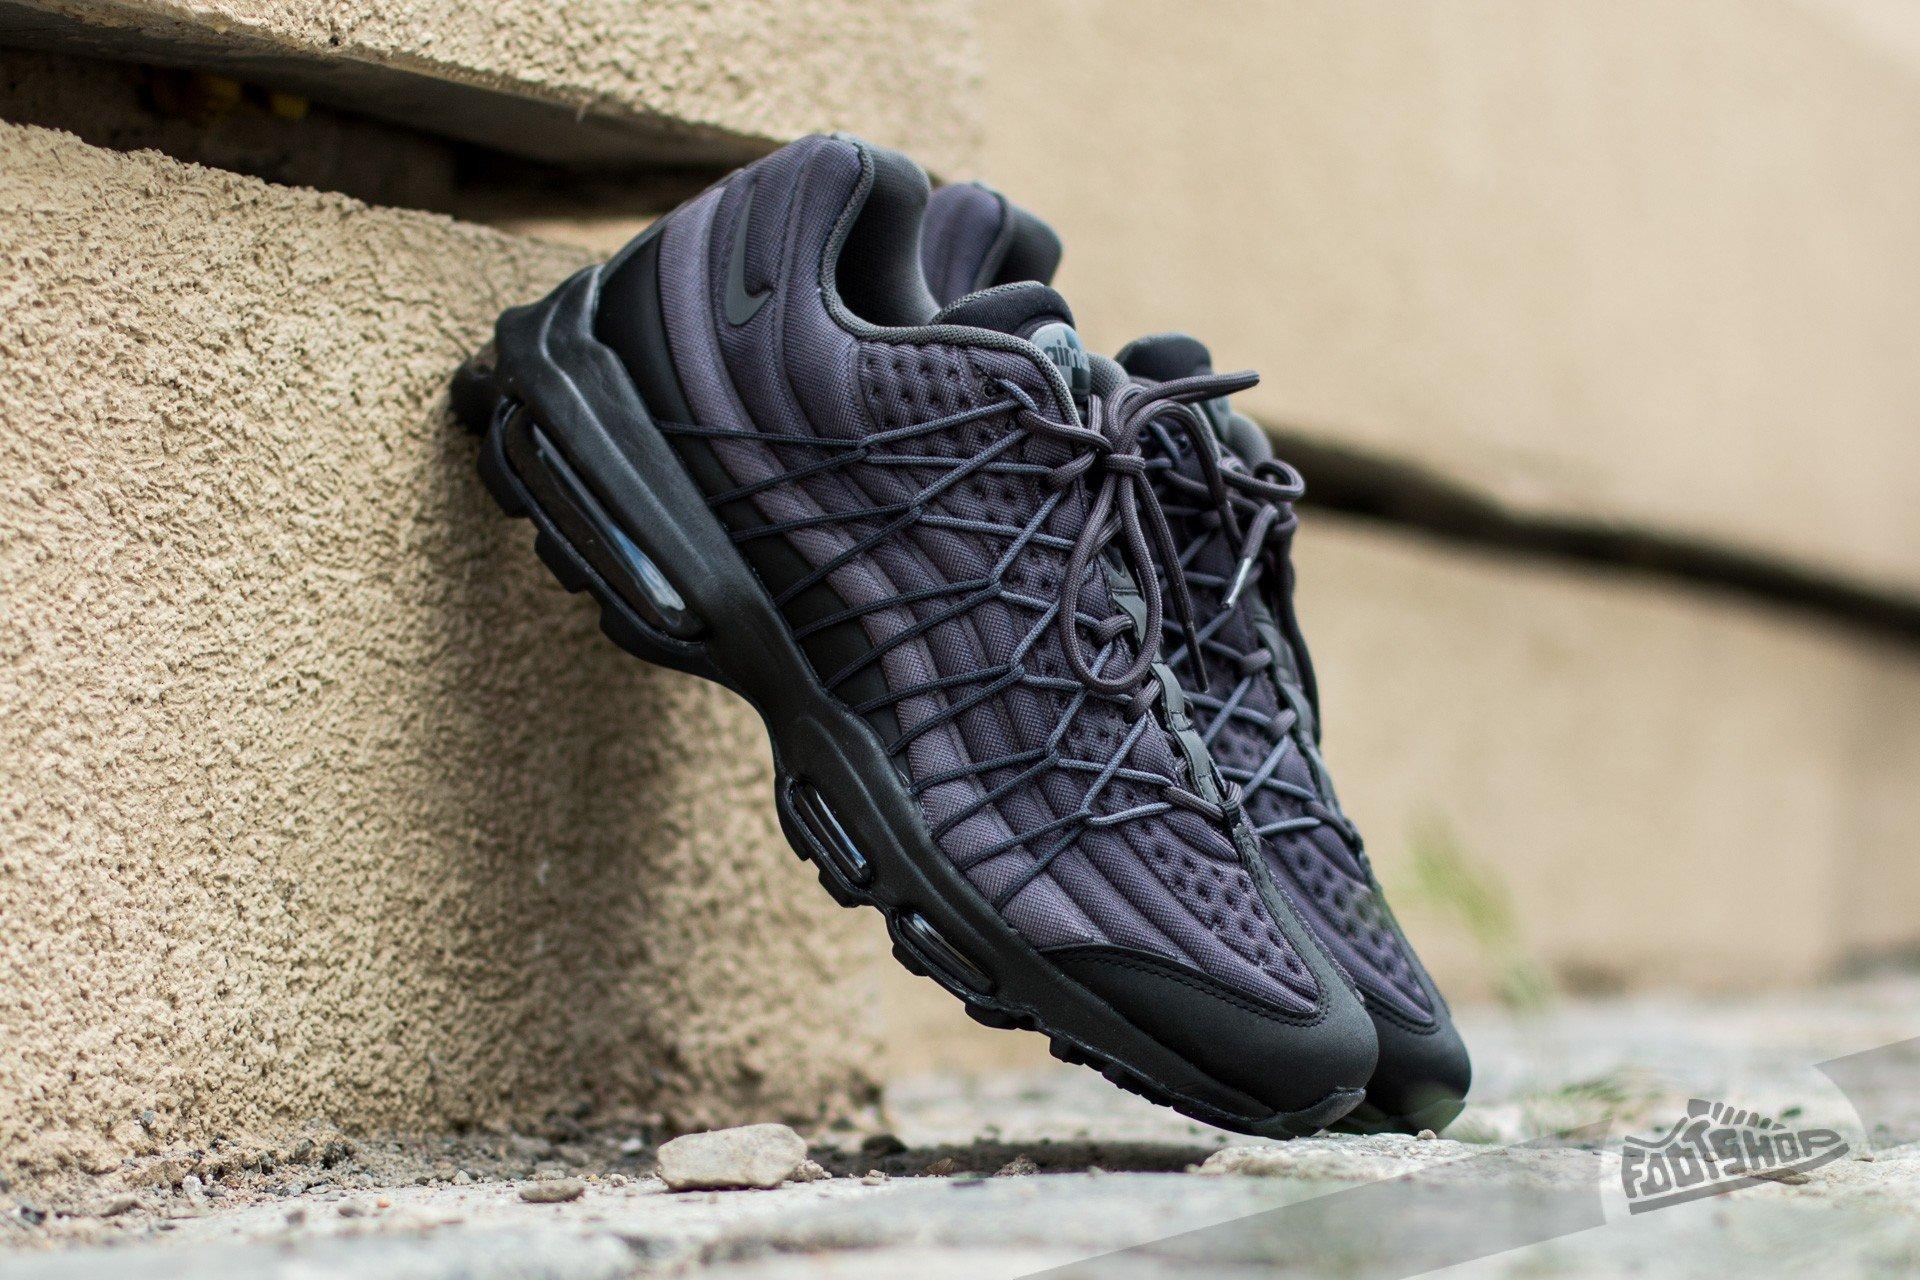 6870394d70c6b2 Nike Air Max 95 Ultra Se Black  Dark Grey-Black-Anthracite